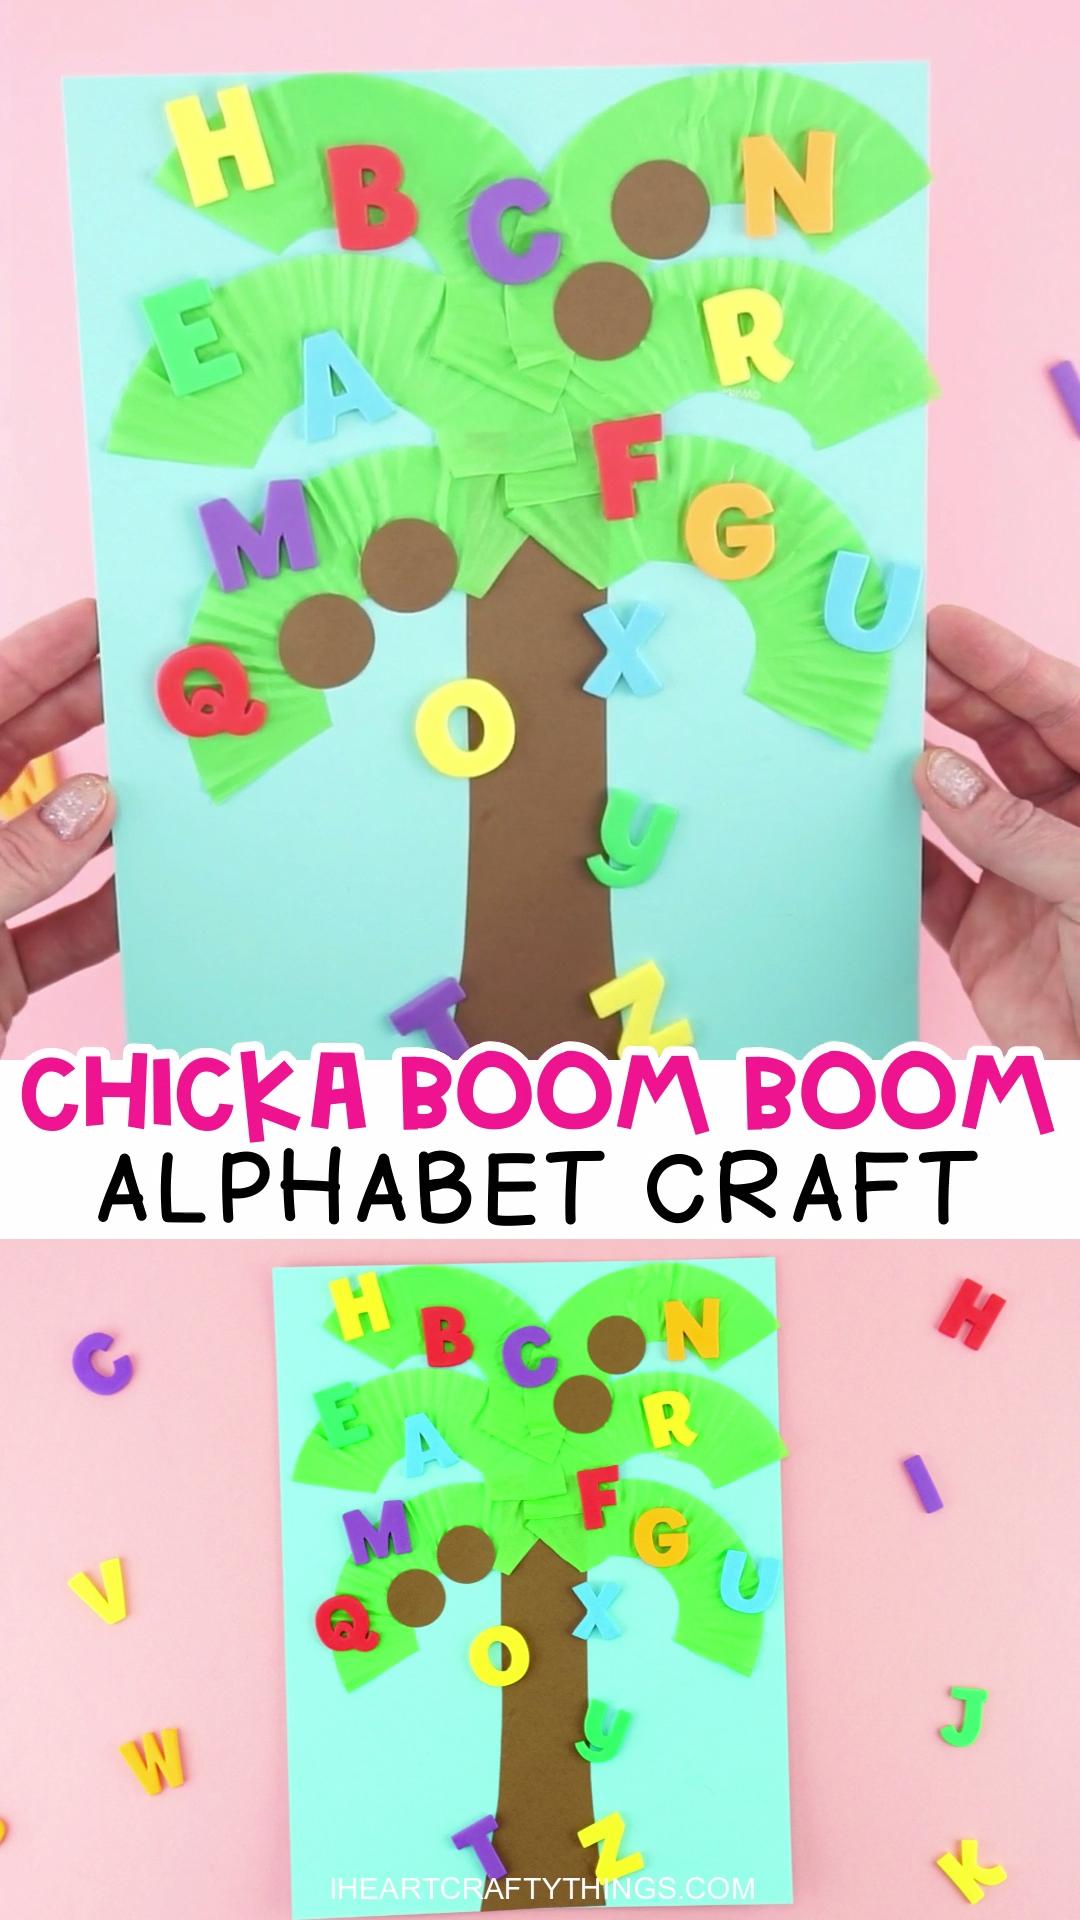 Chicka Chicka Boom Boom Craft In